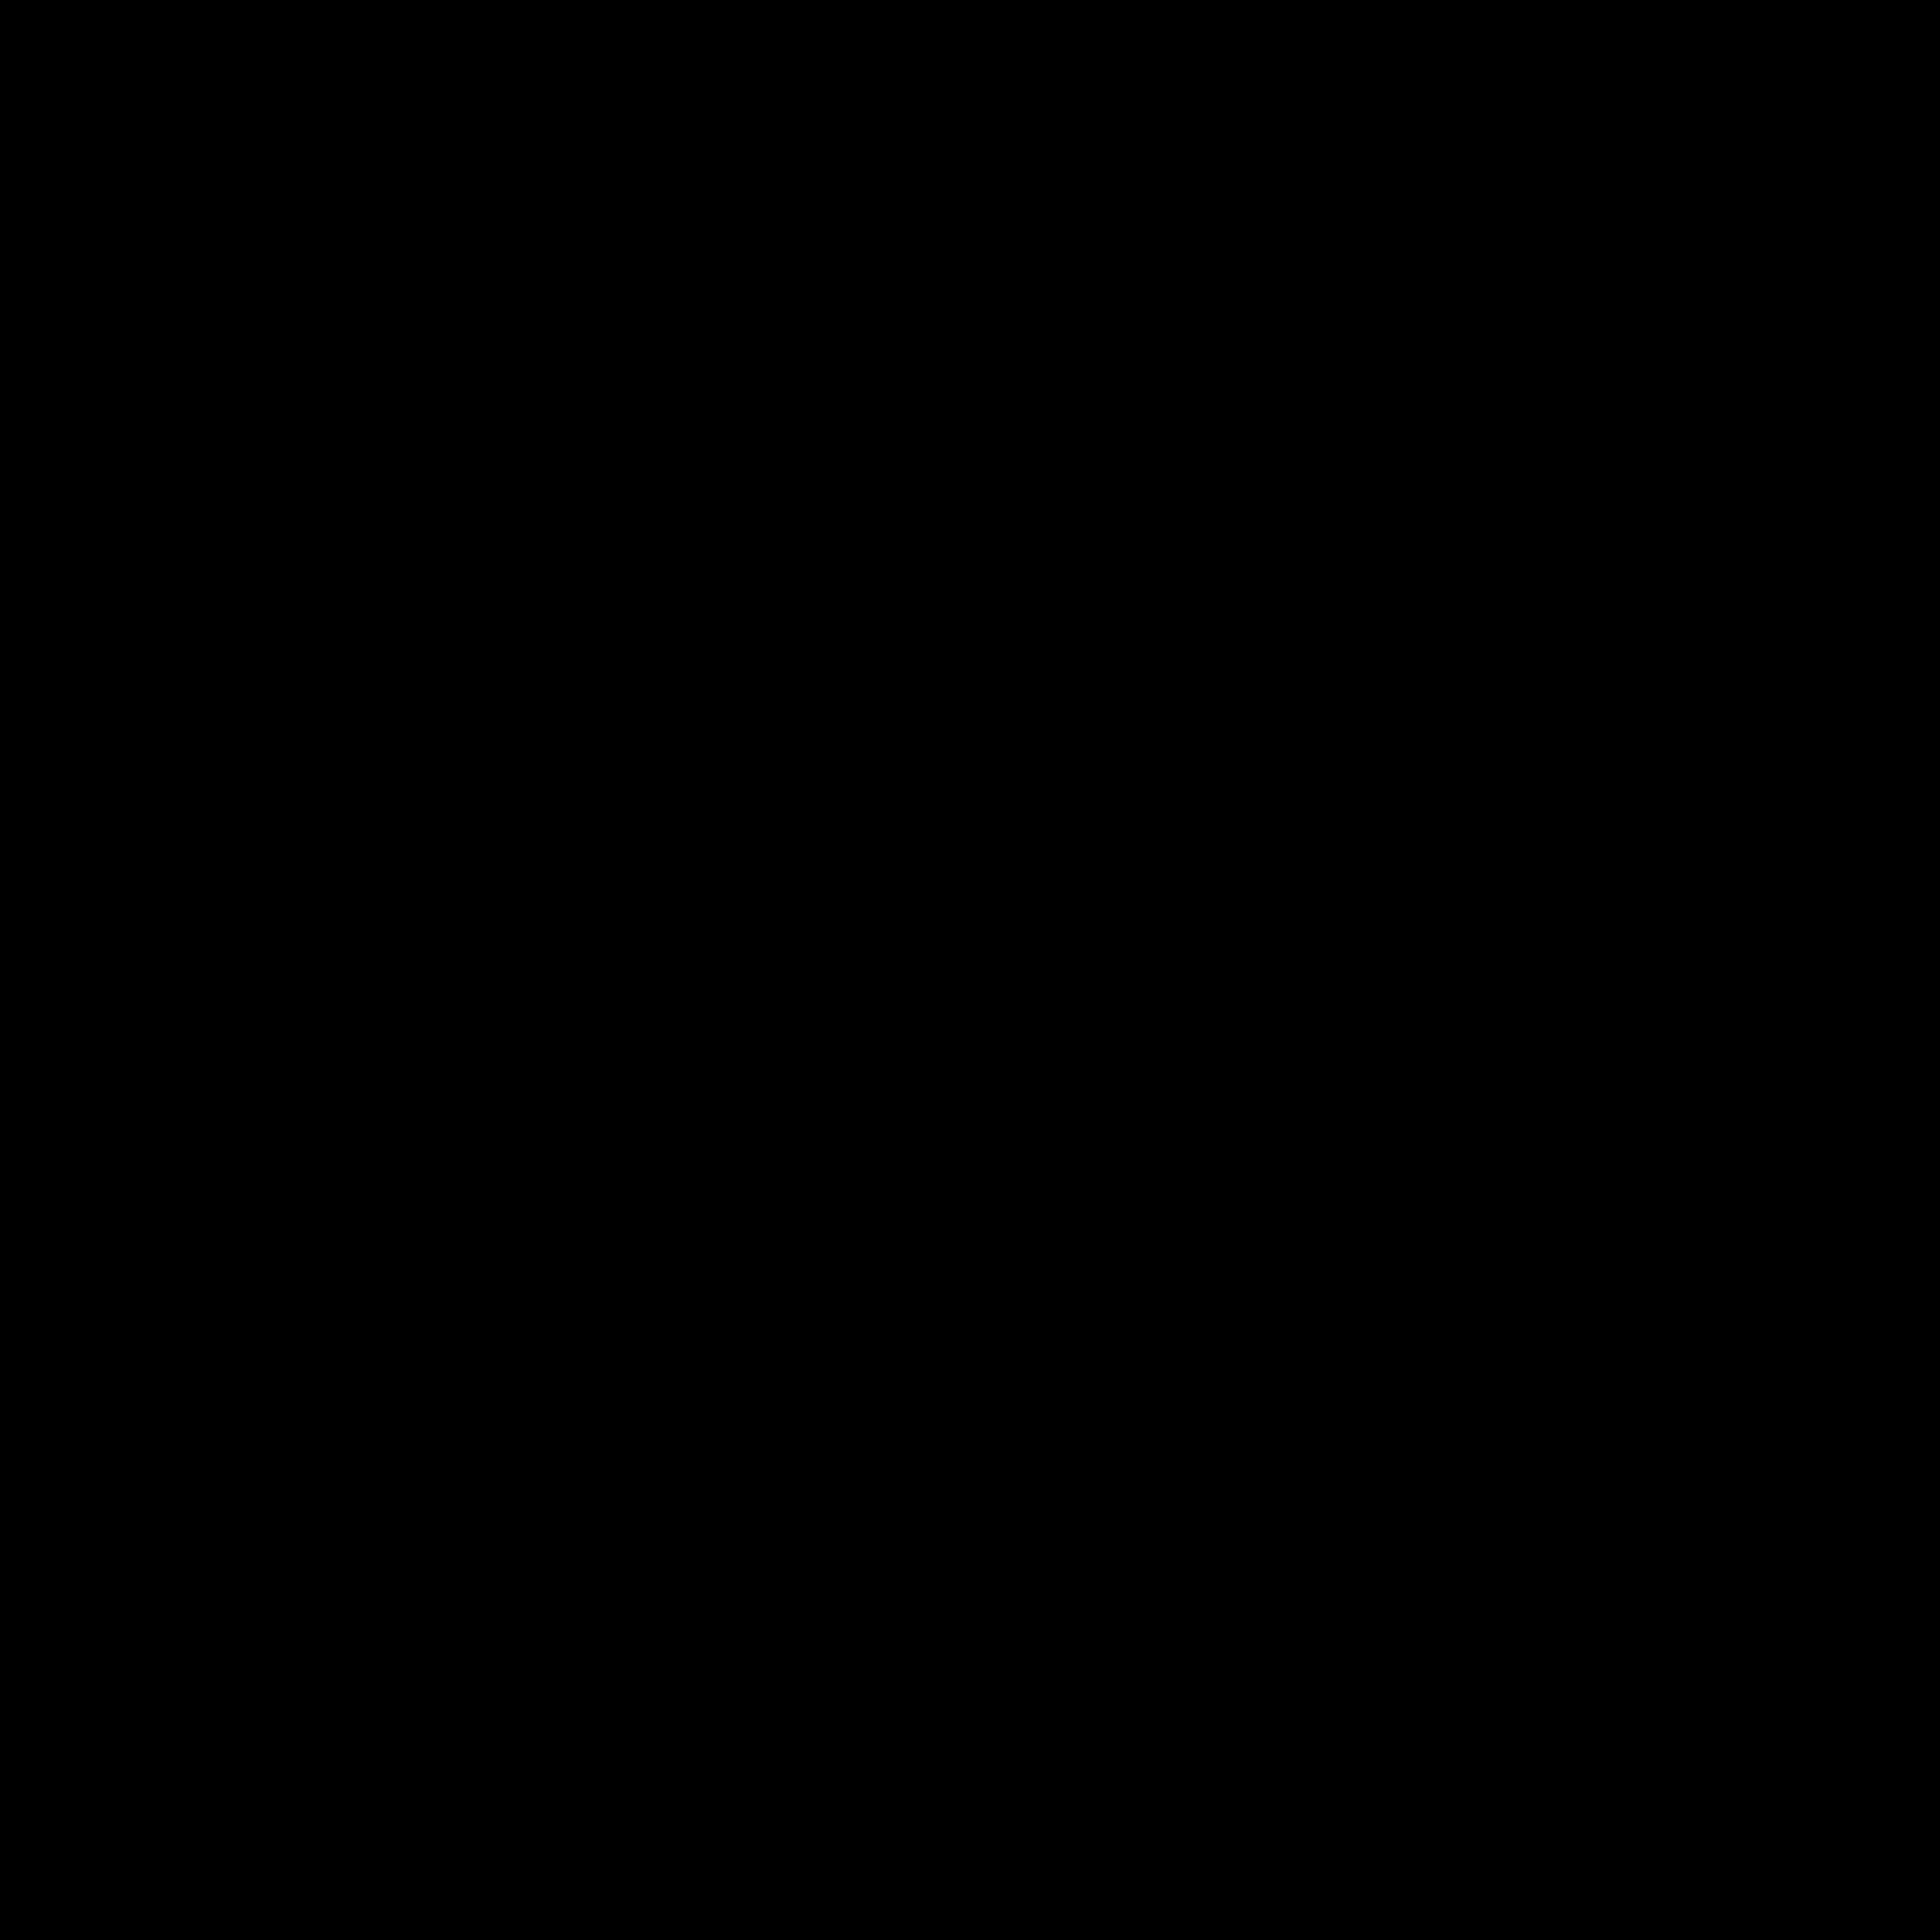 nike-4-logo-png-transparent.png